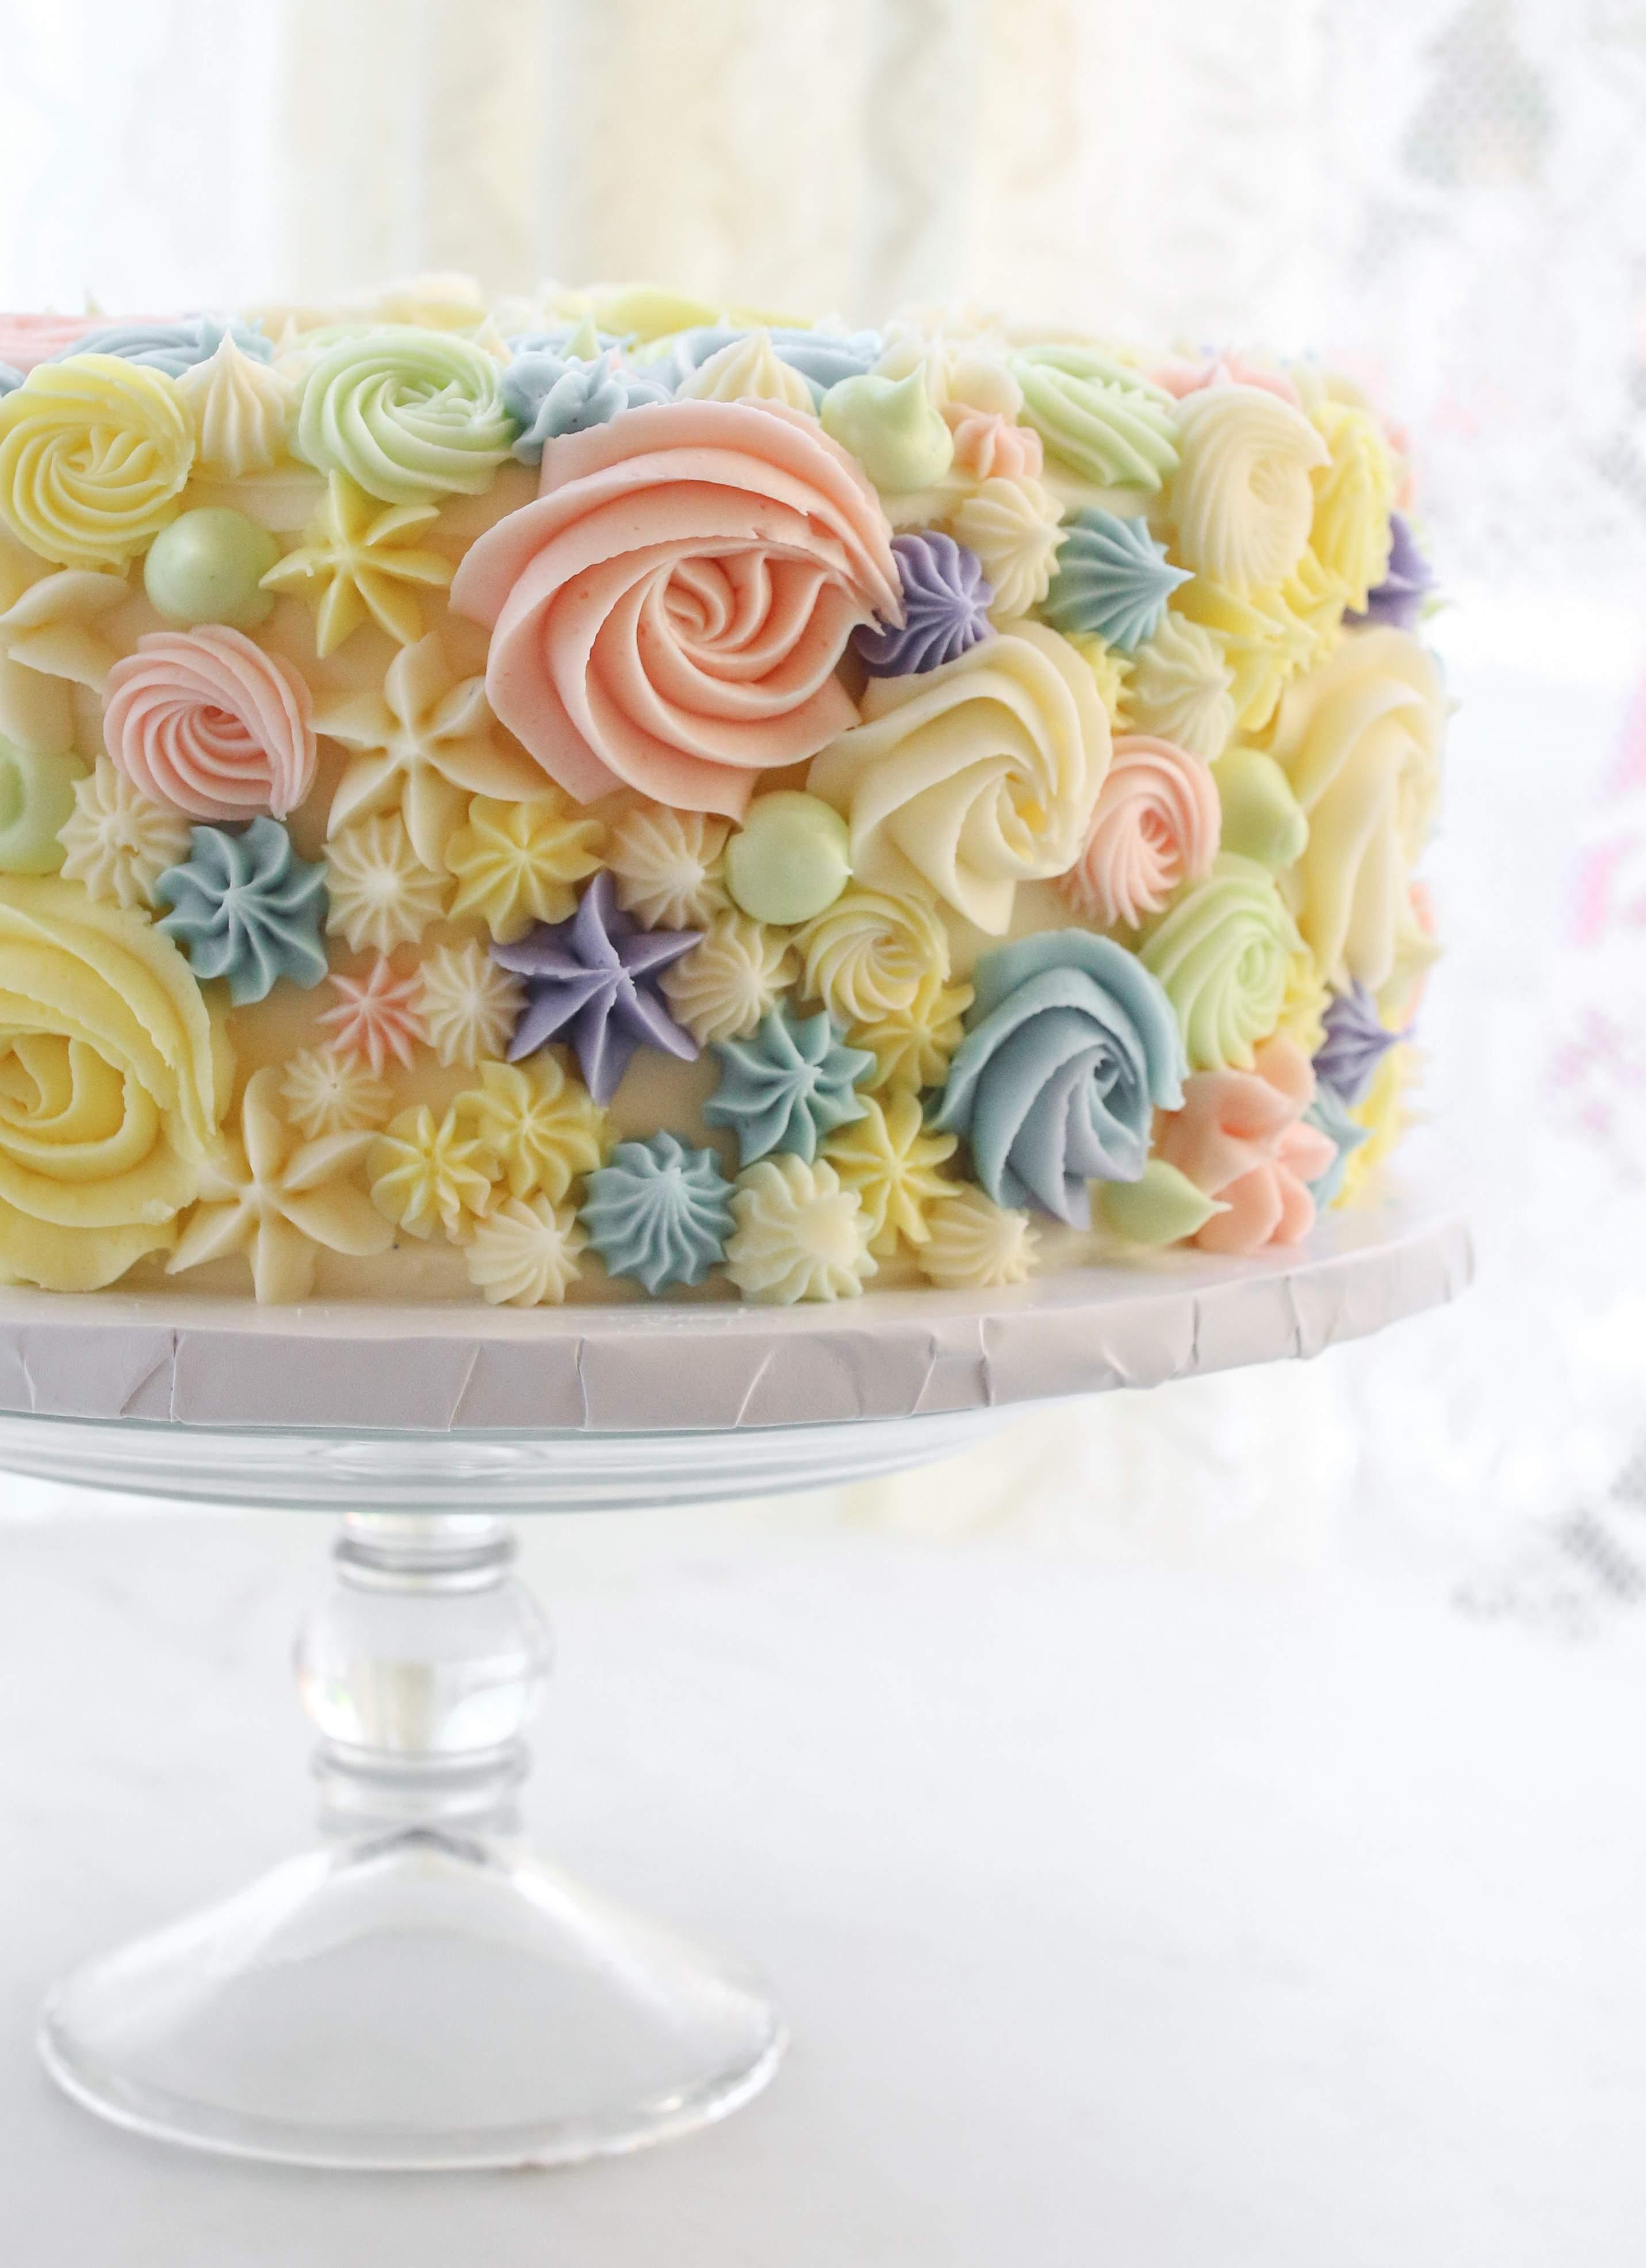 Rose and star cake